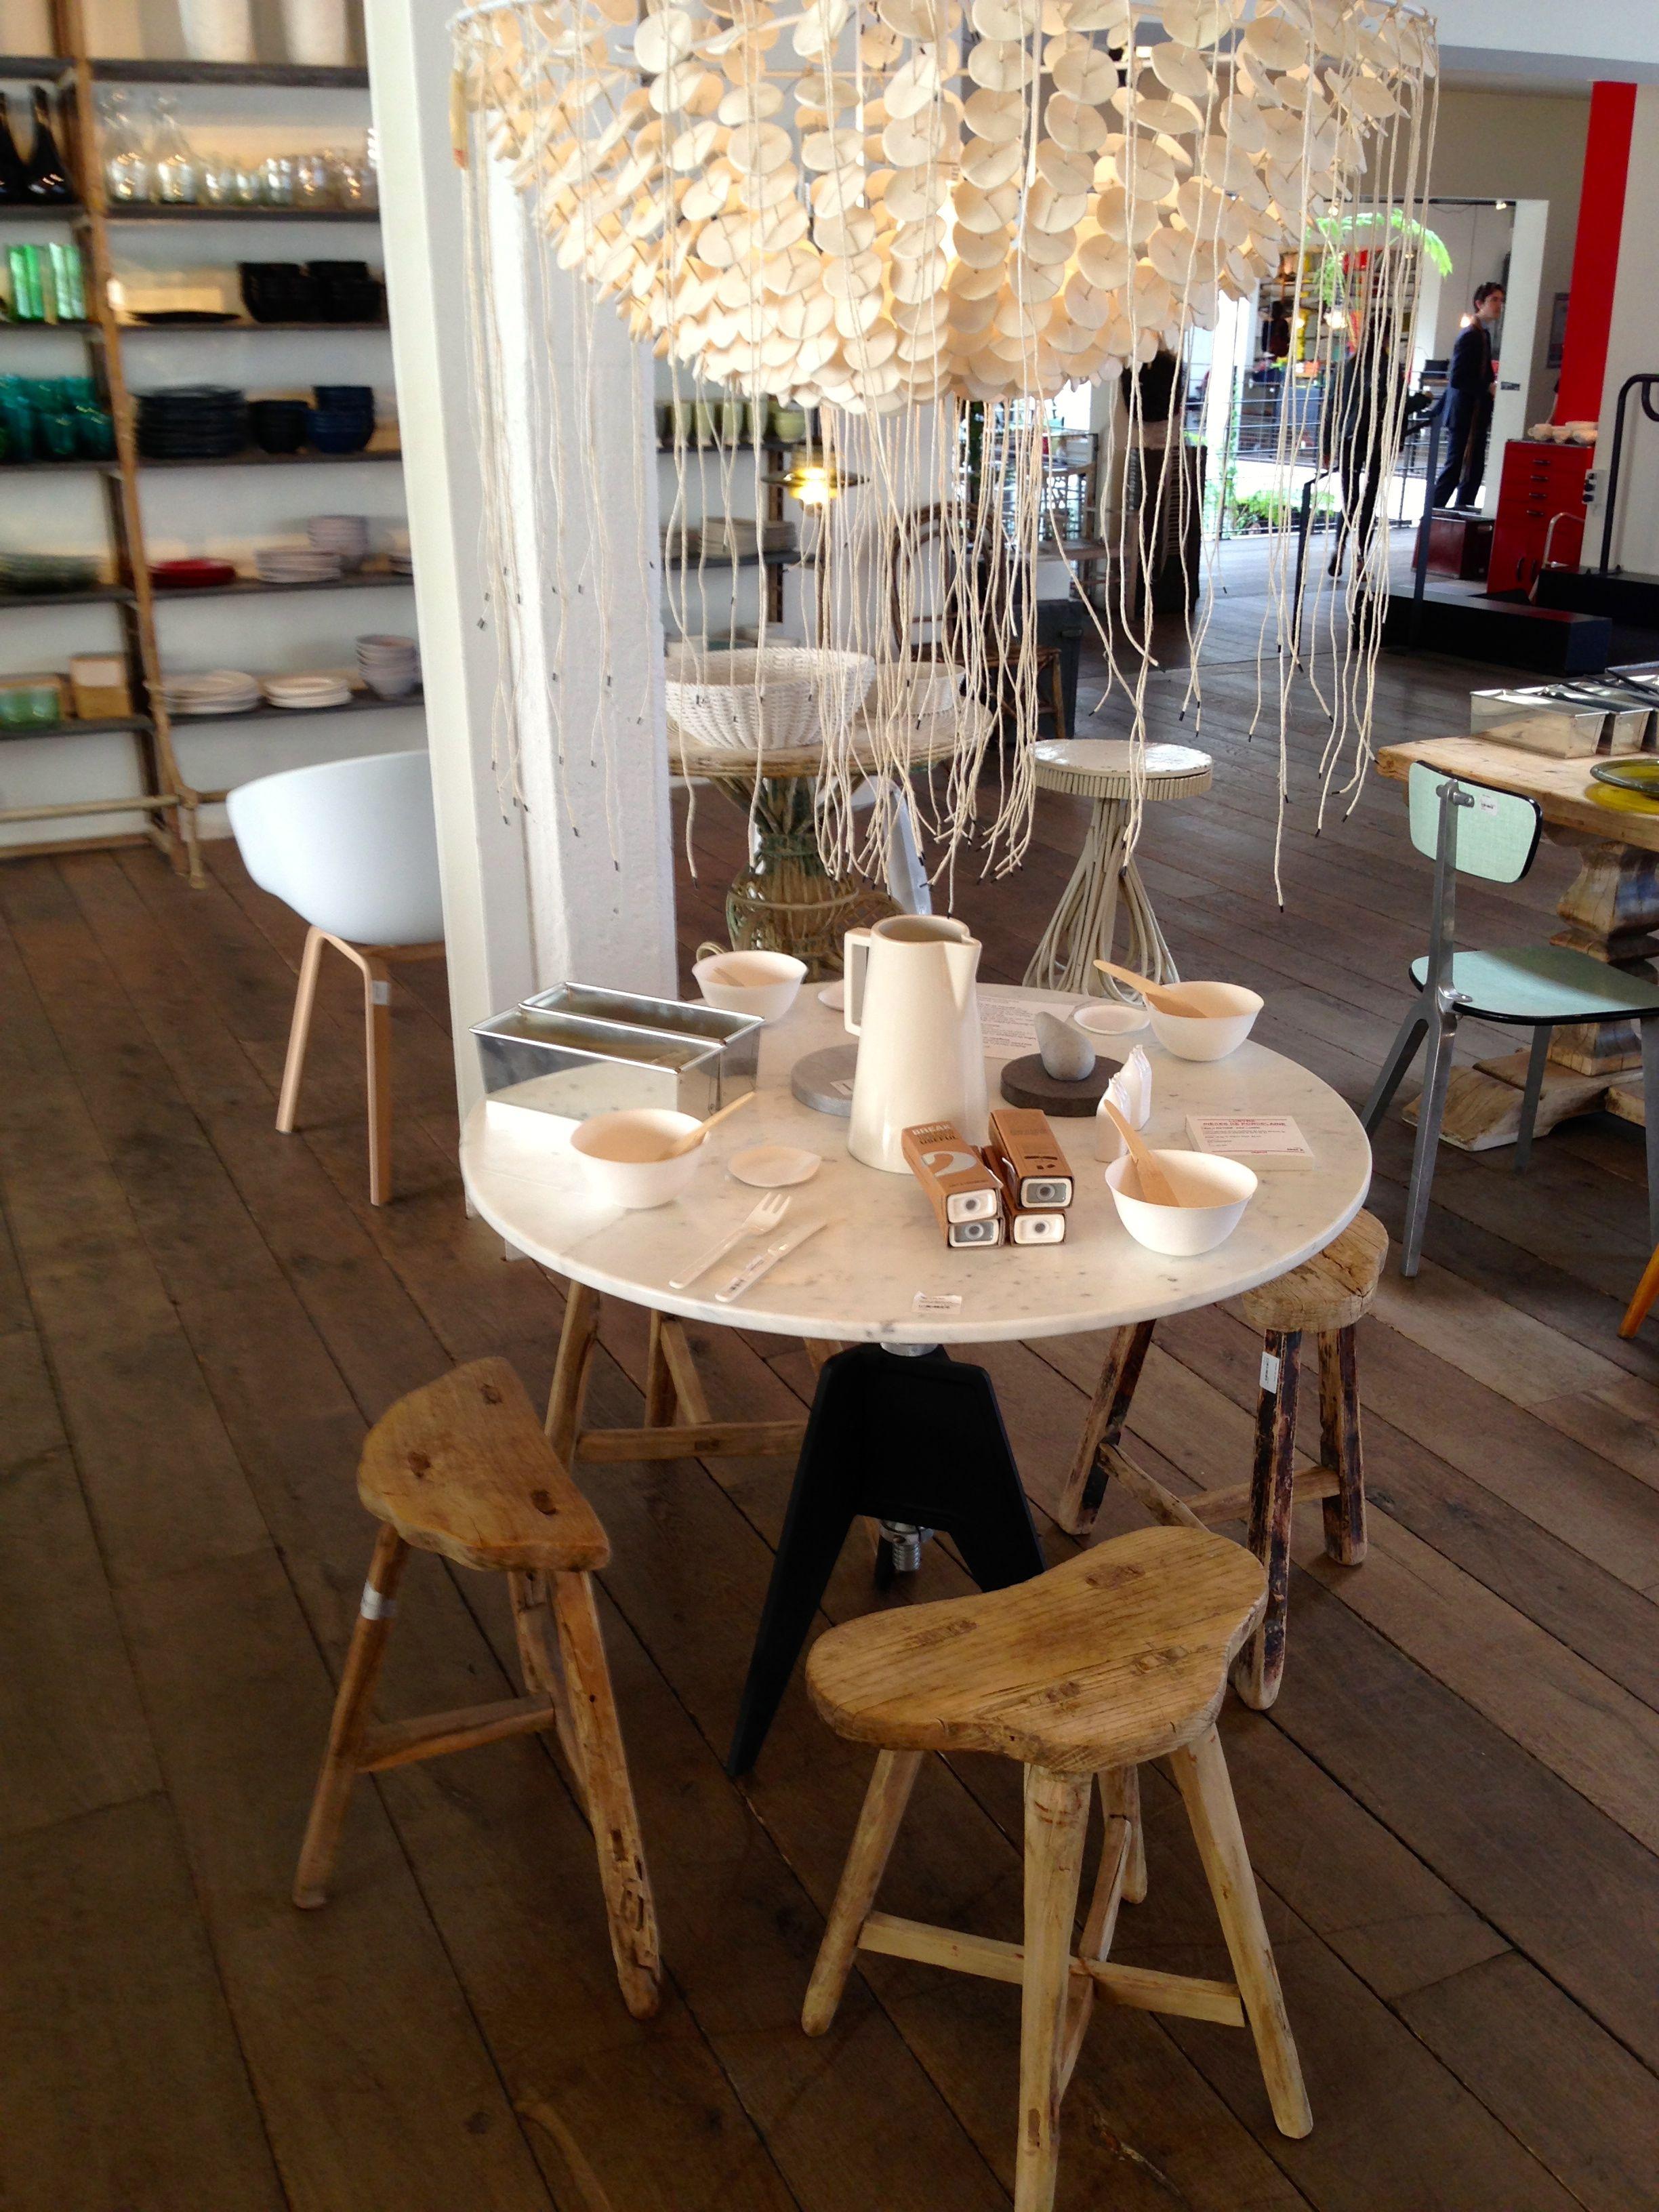 Merci Shop in Paris April 2013